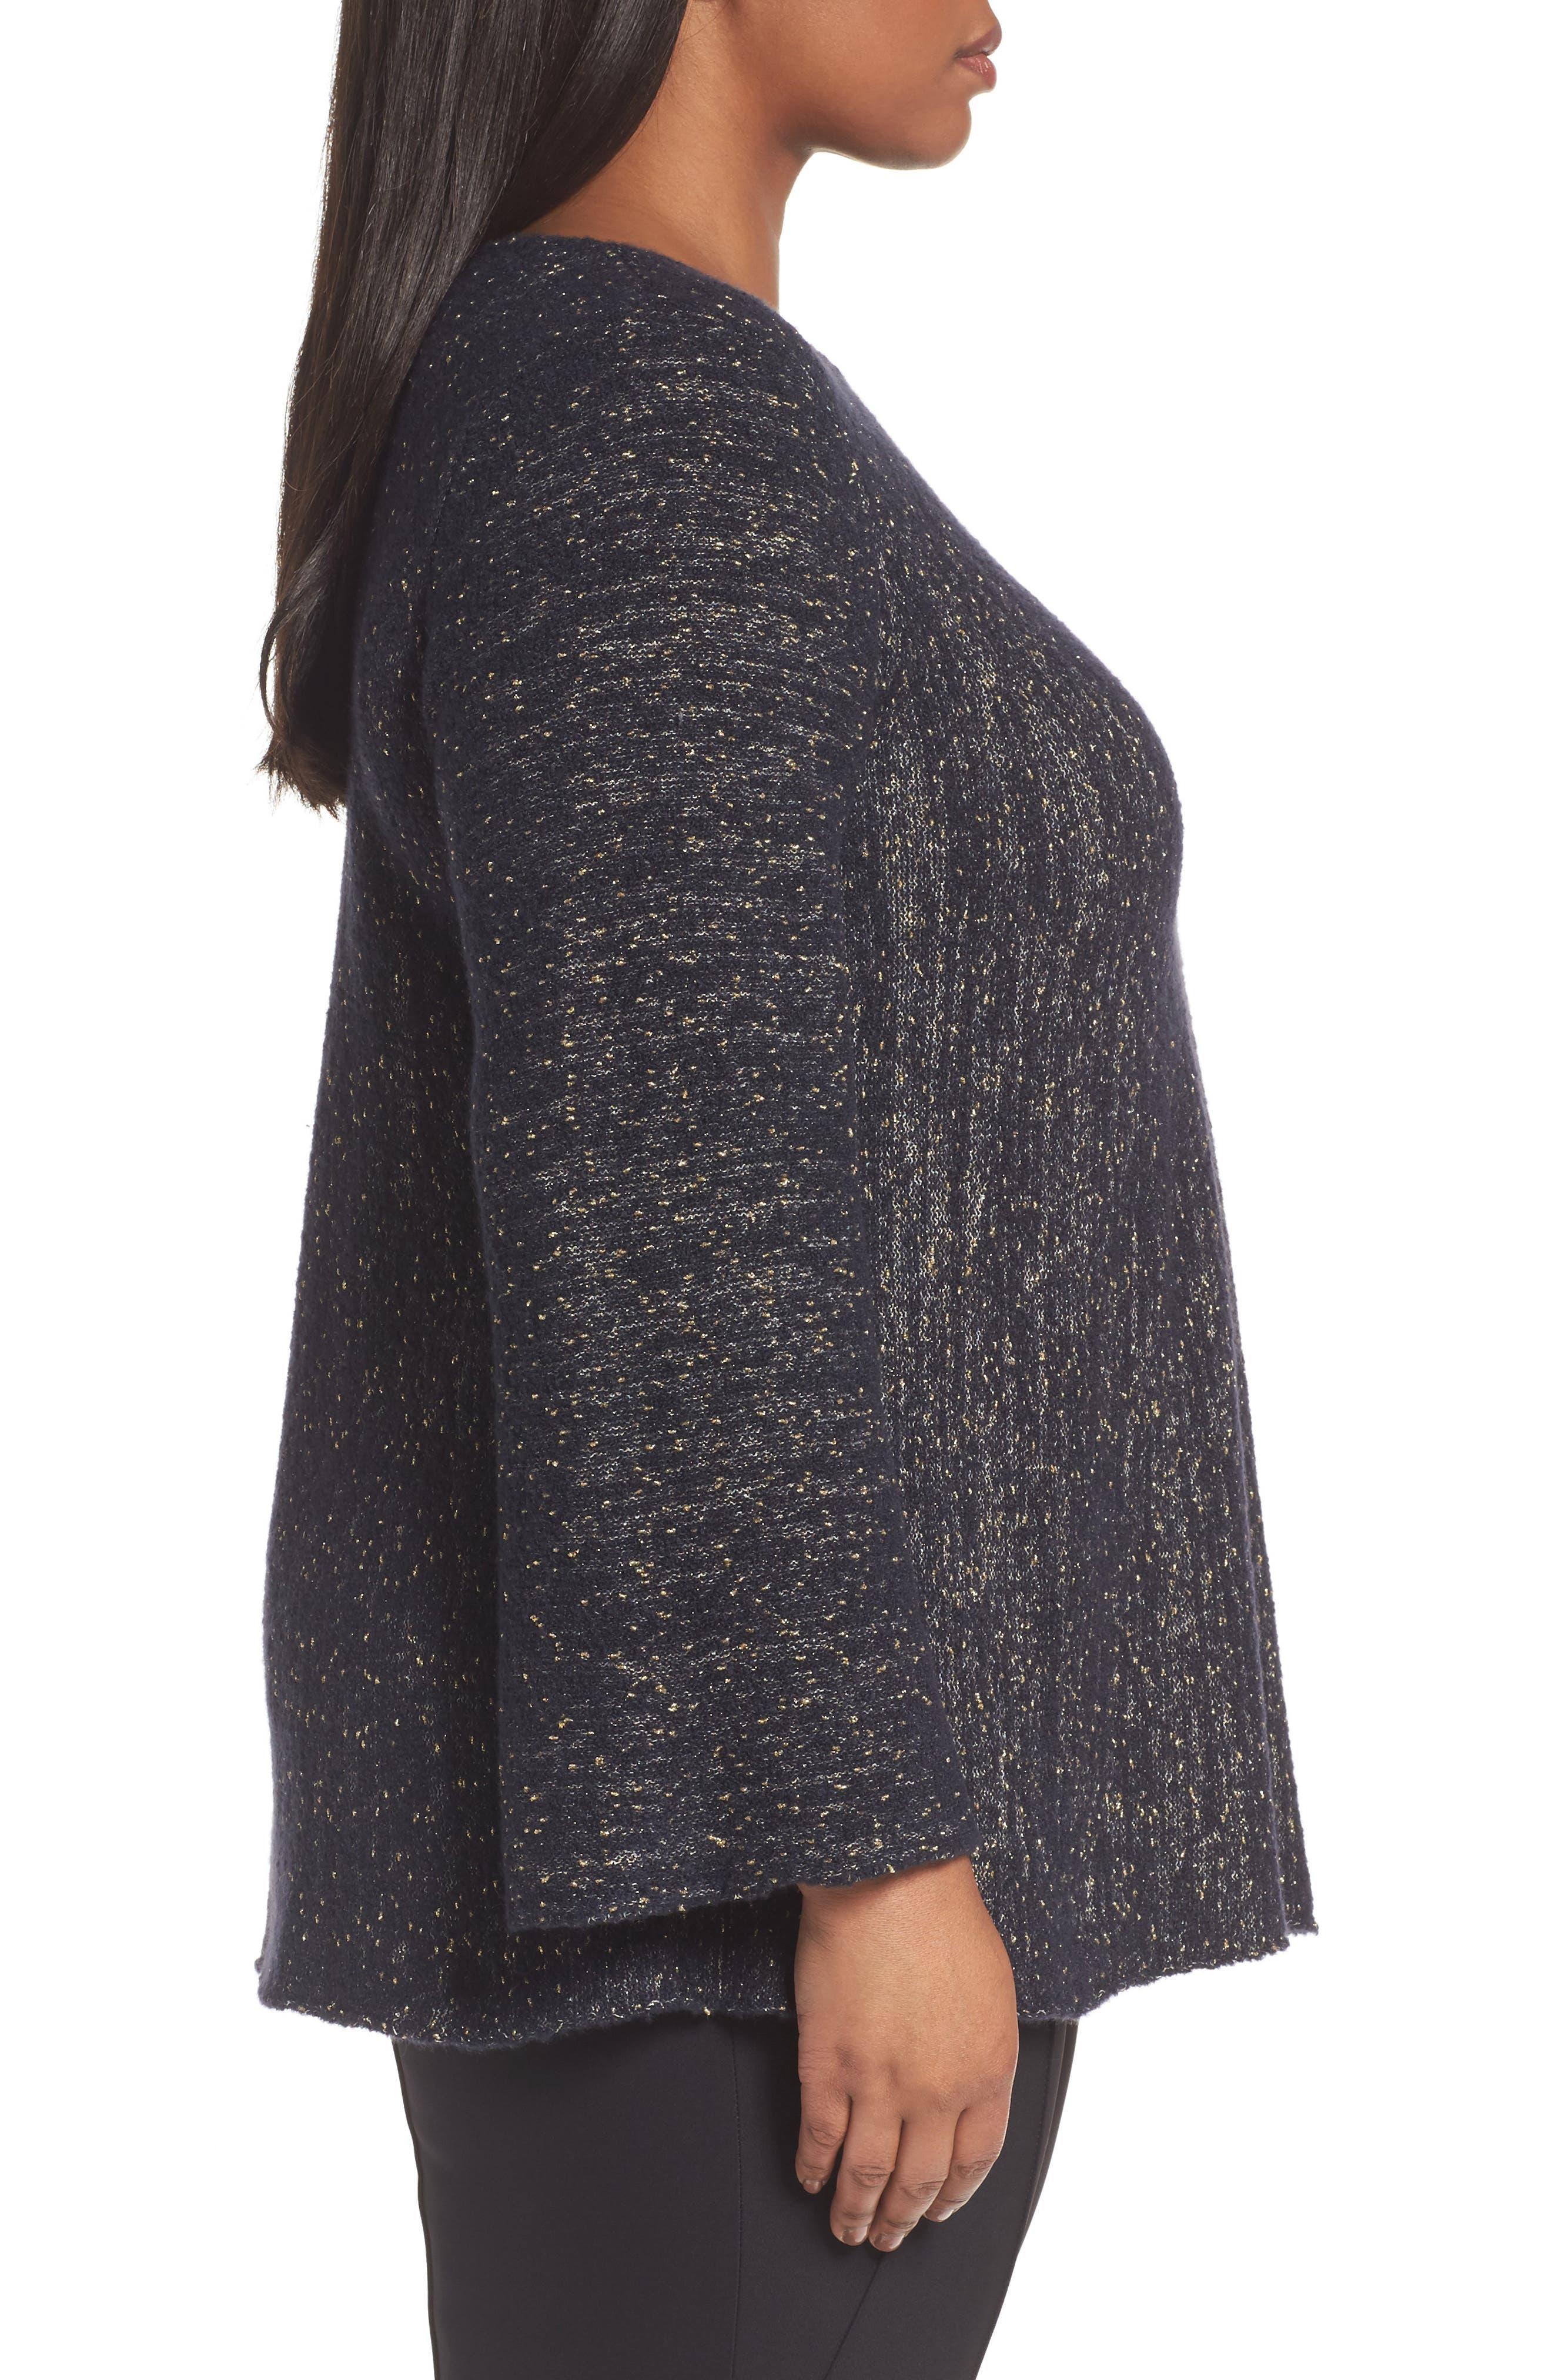 Alternate Image 3  - Lafayette 148 Metallic Knit A-Line Sweater (Plus Size)